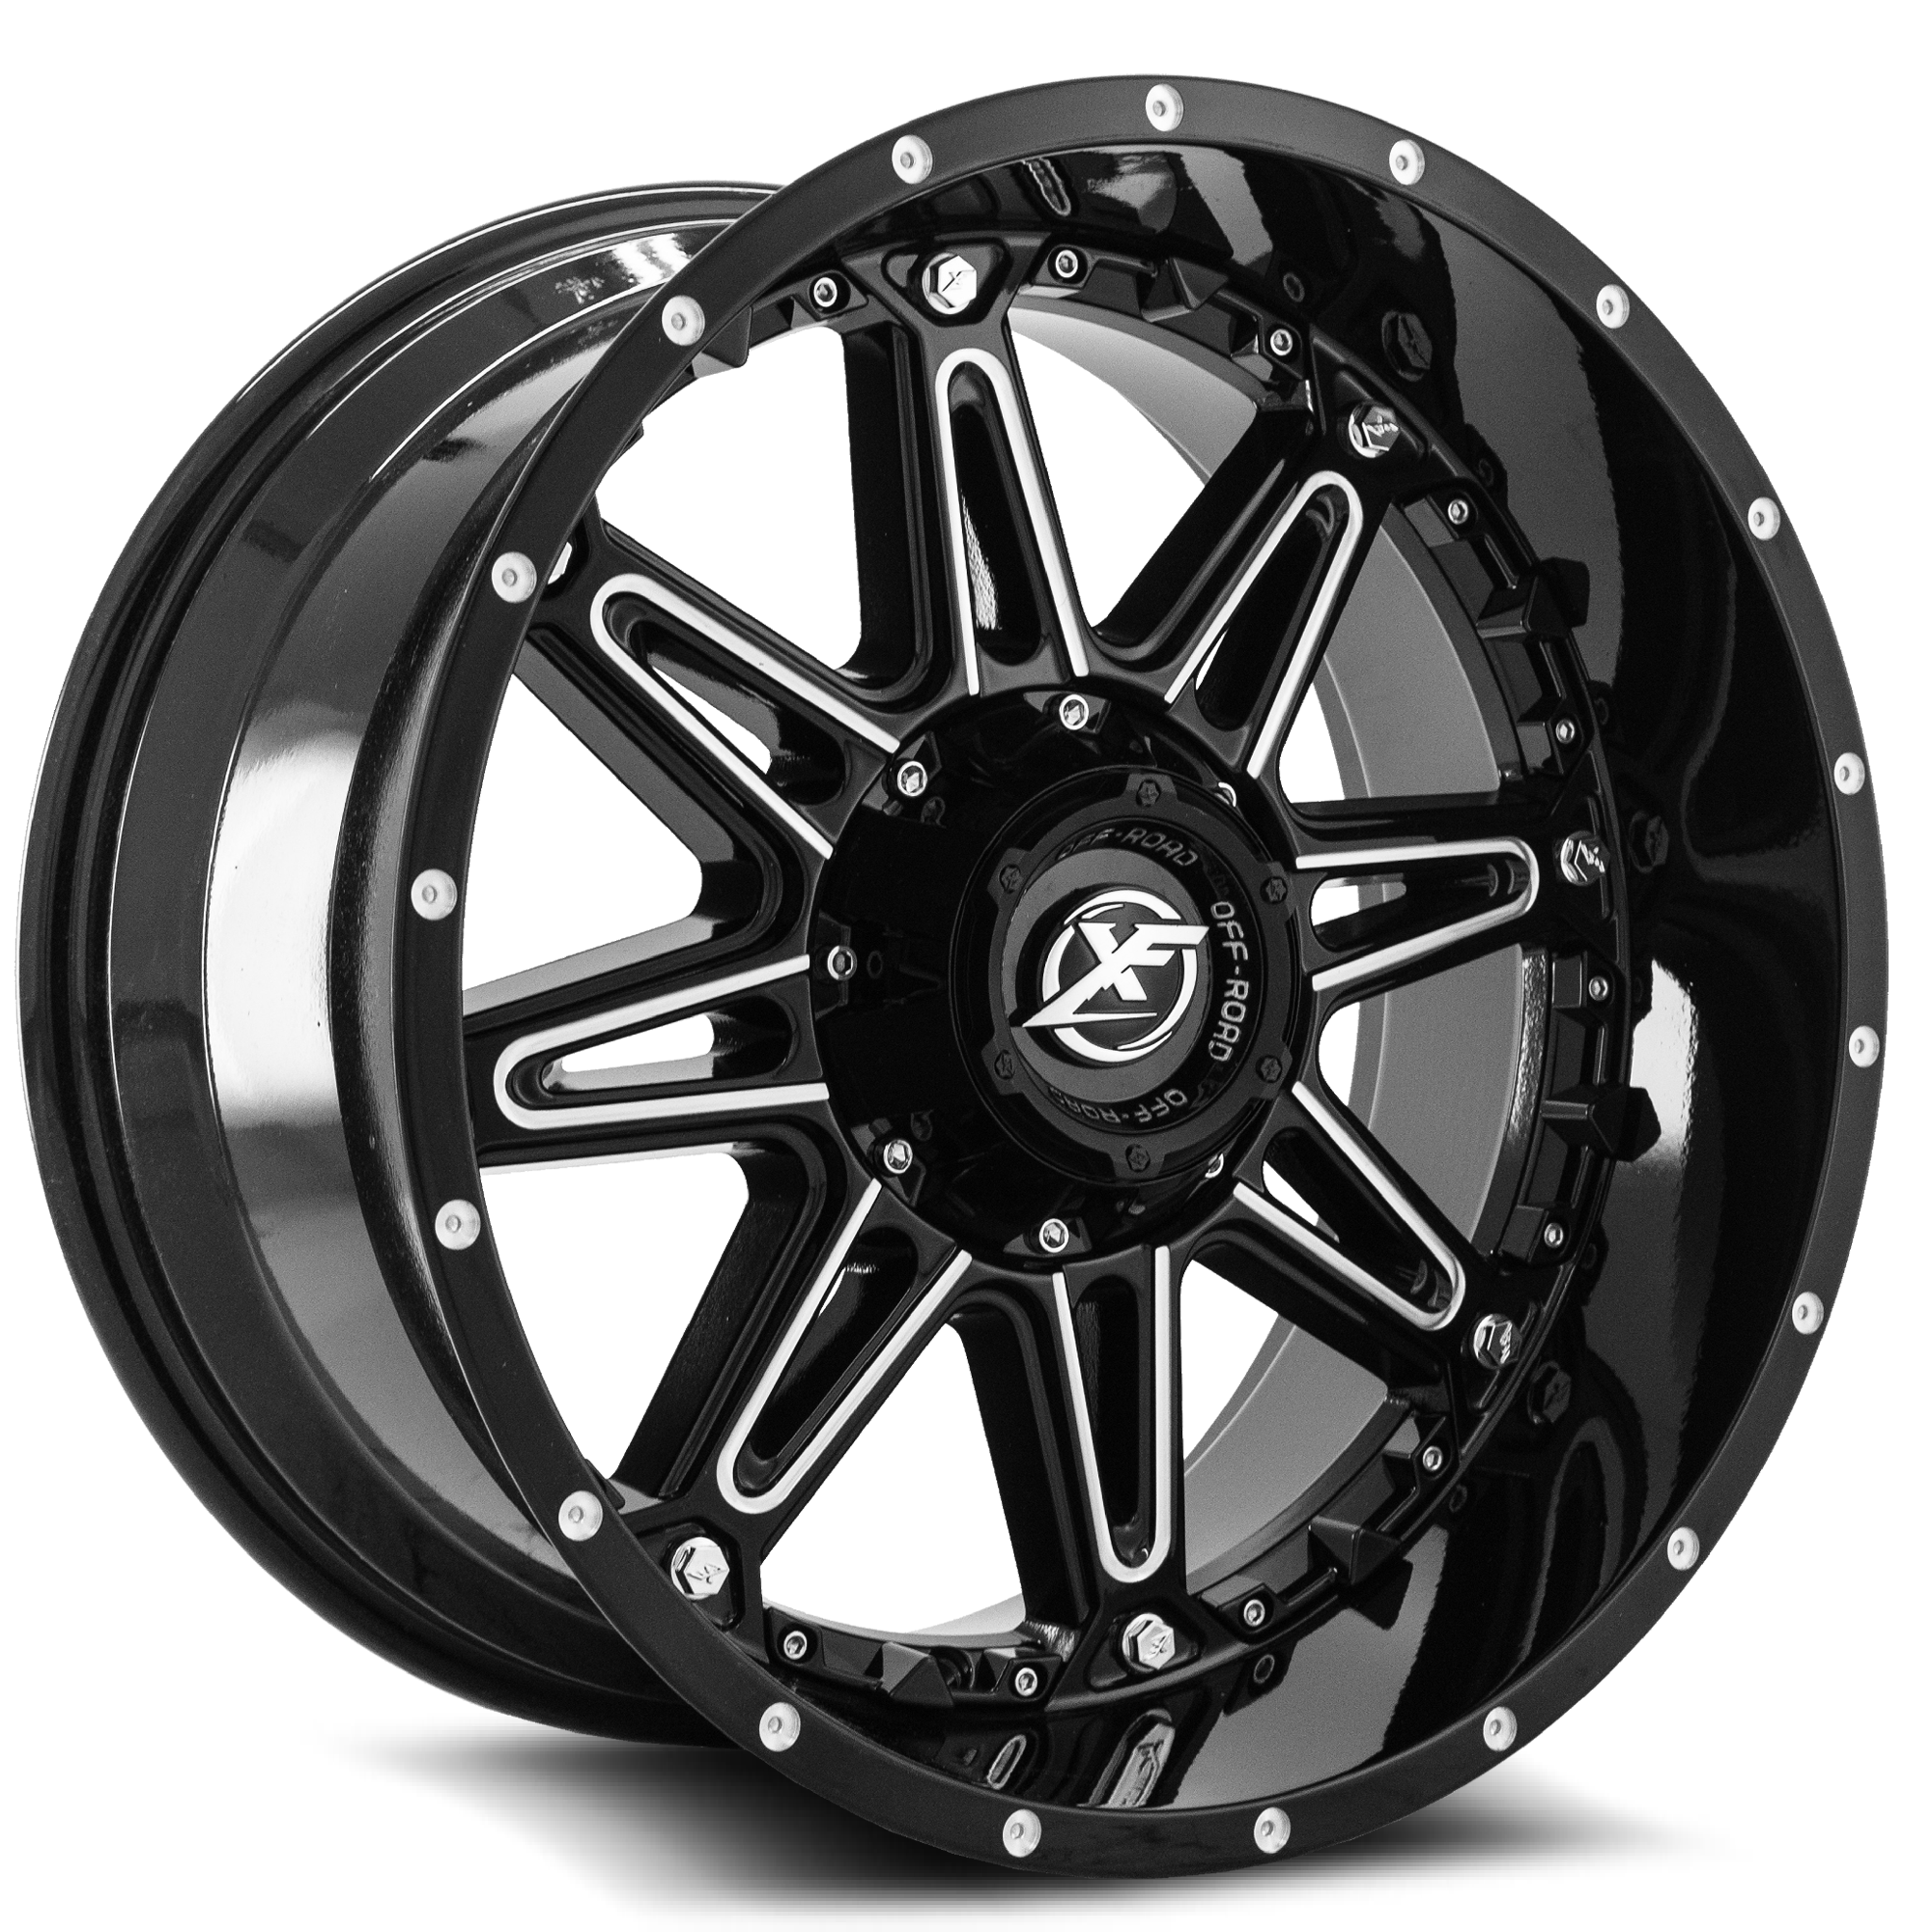 Xf Off Road Wheels